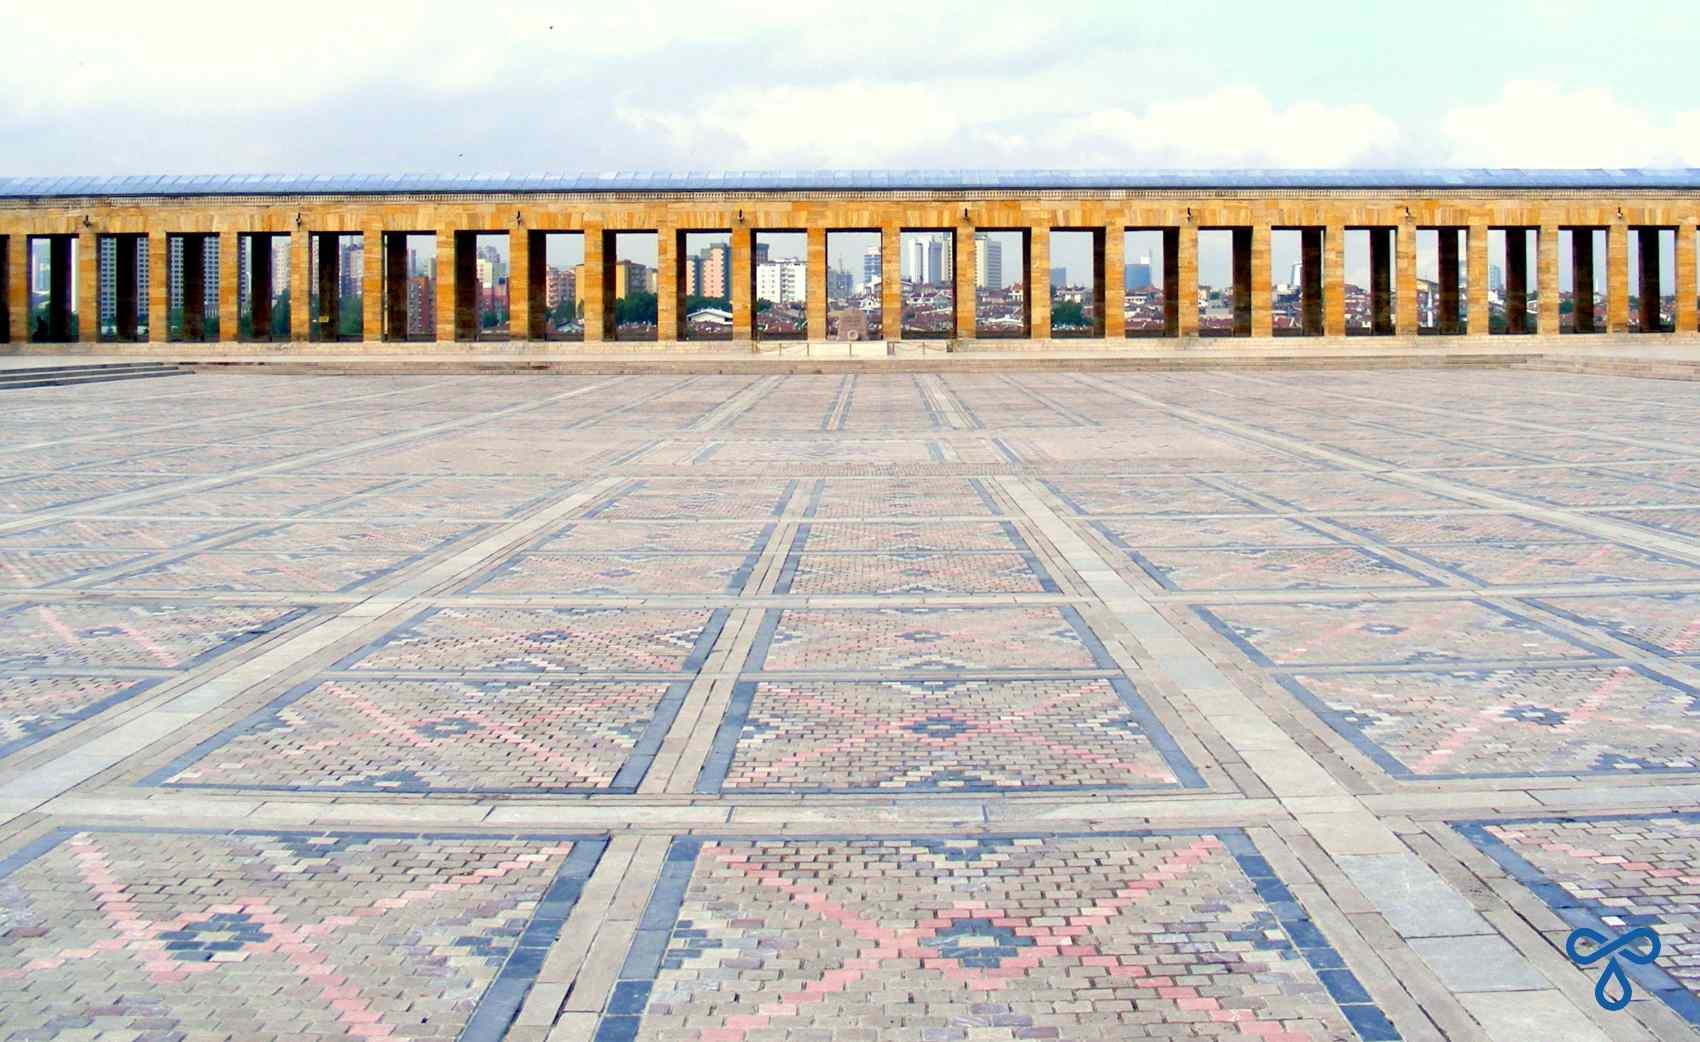 Ceremonial Courtyard, Anıtkabir, Ankara